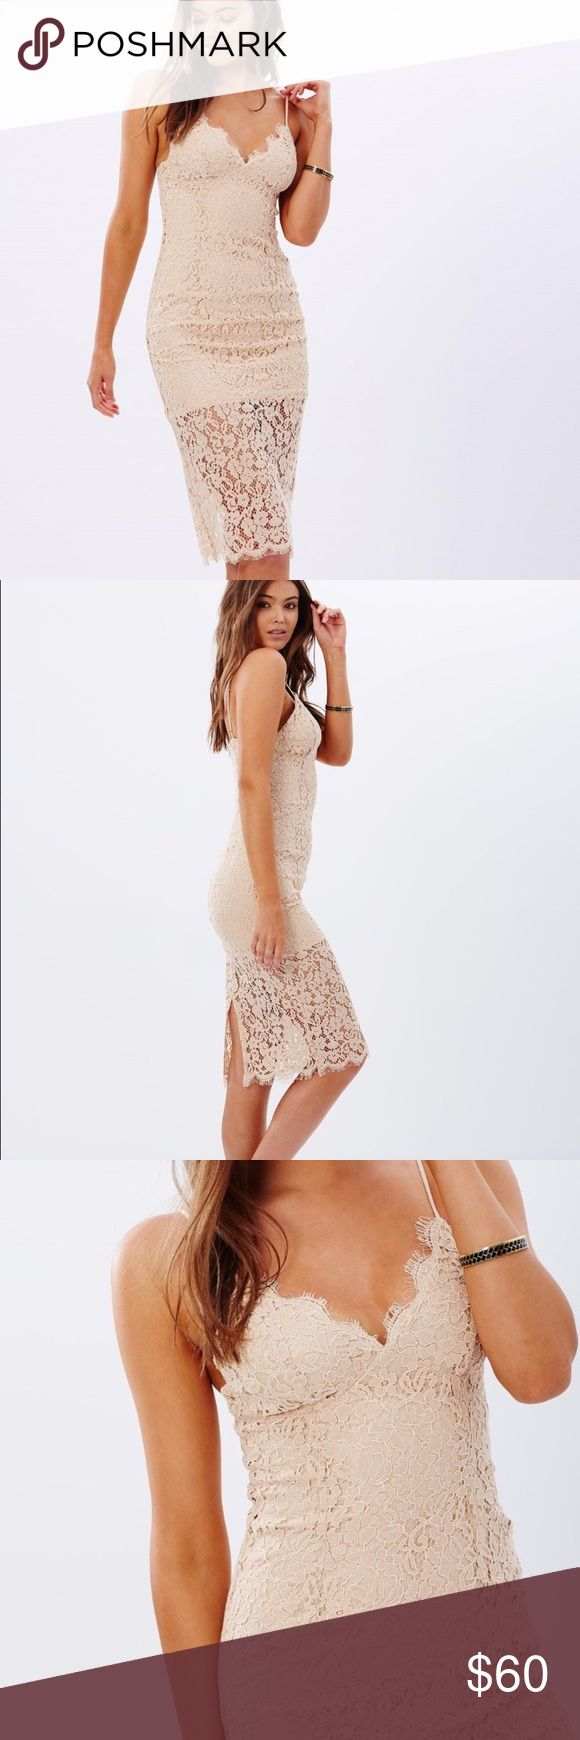 ONE DAY SALE 🎉Bardot dress Used once for 5 hours Bardot Dresses Midi